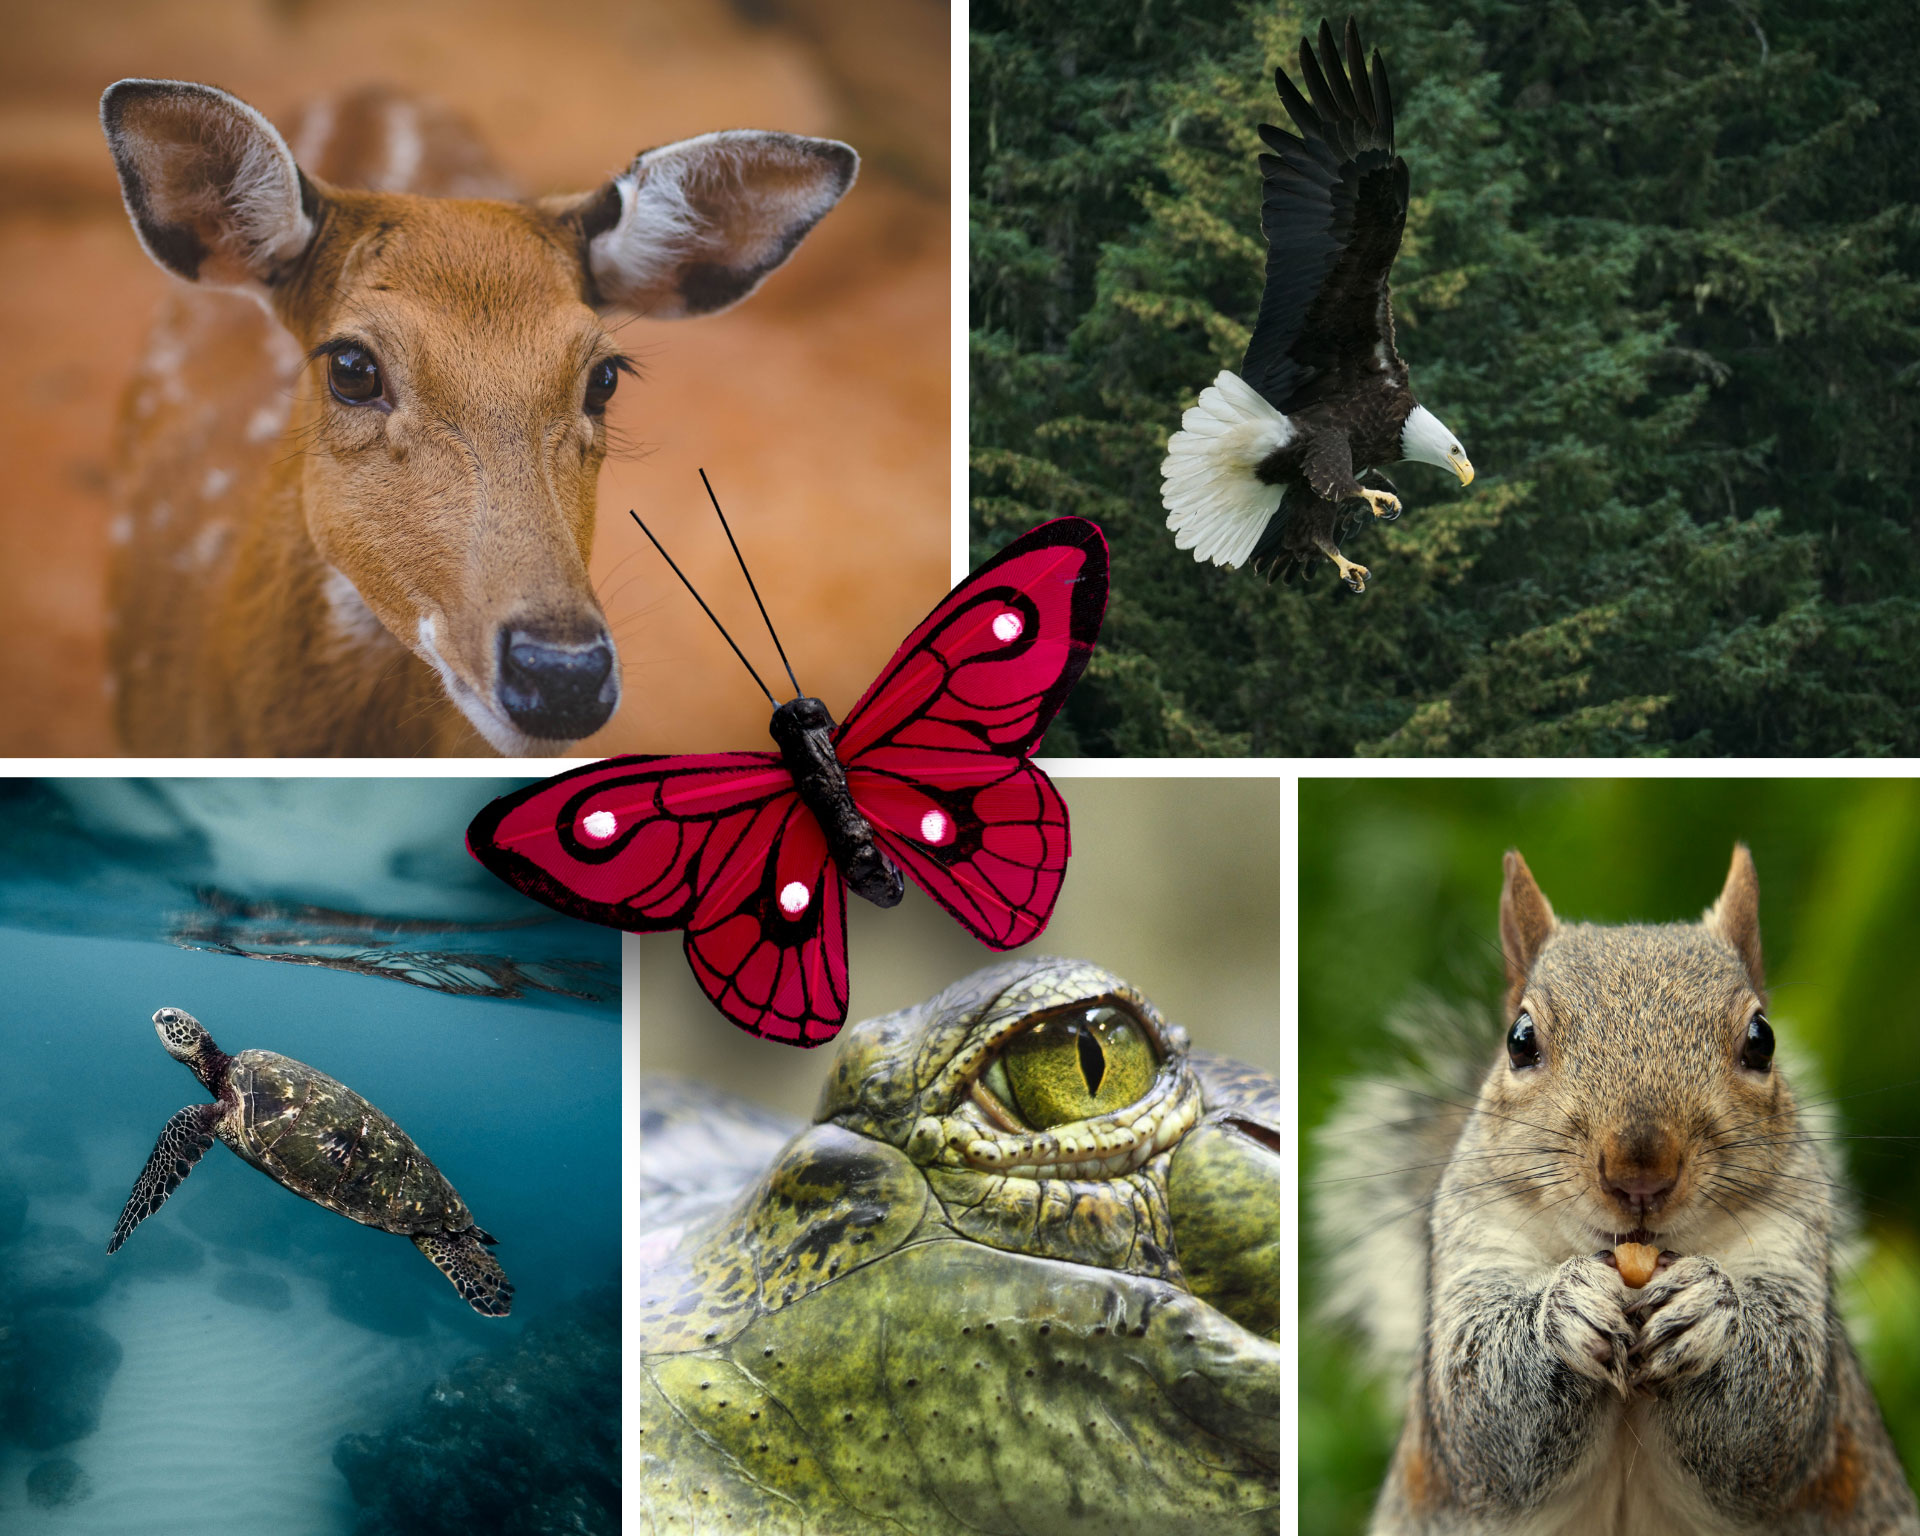 Wildlife 101: Feathers & Scales